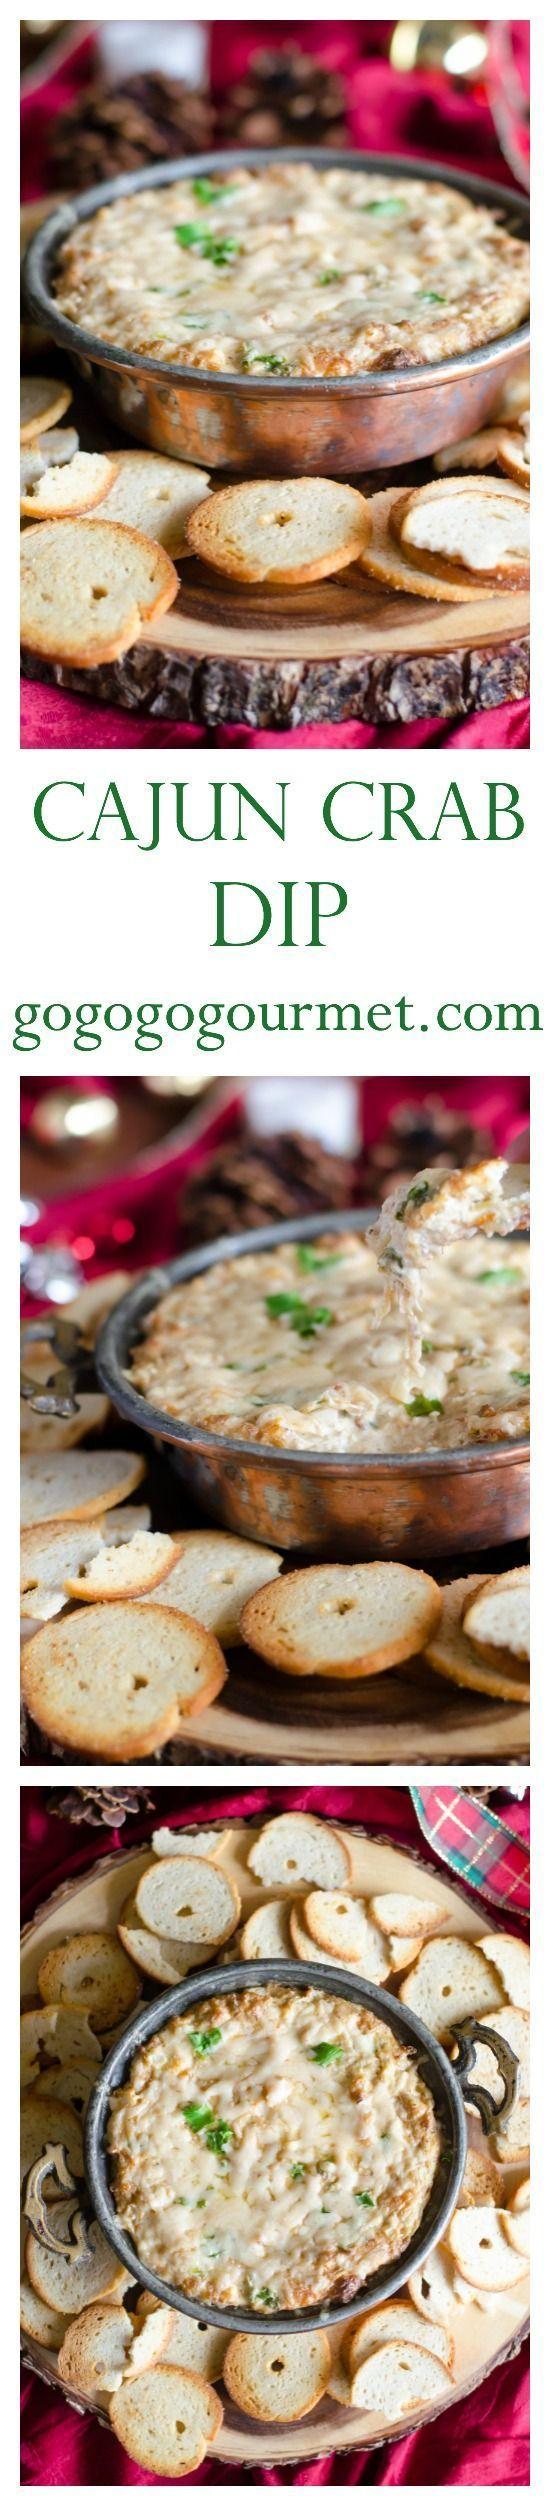 Everyone loves a good dip for parties- and this Cajun Crab Dip is truly addicting! | Go Go Go Gourmet /gogogogourmet/